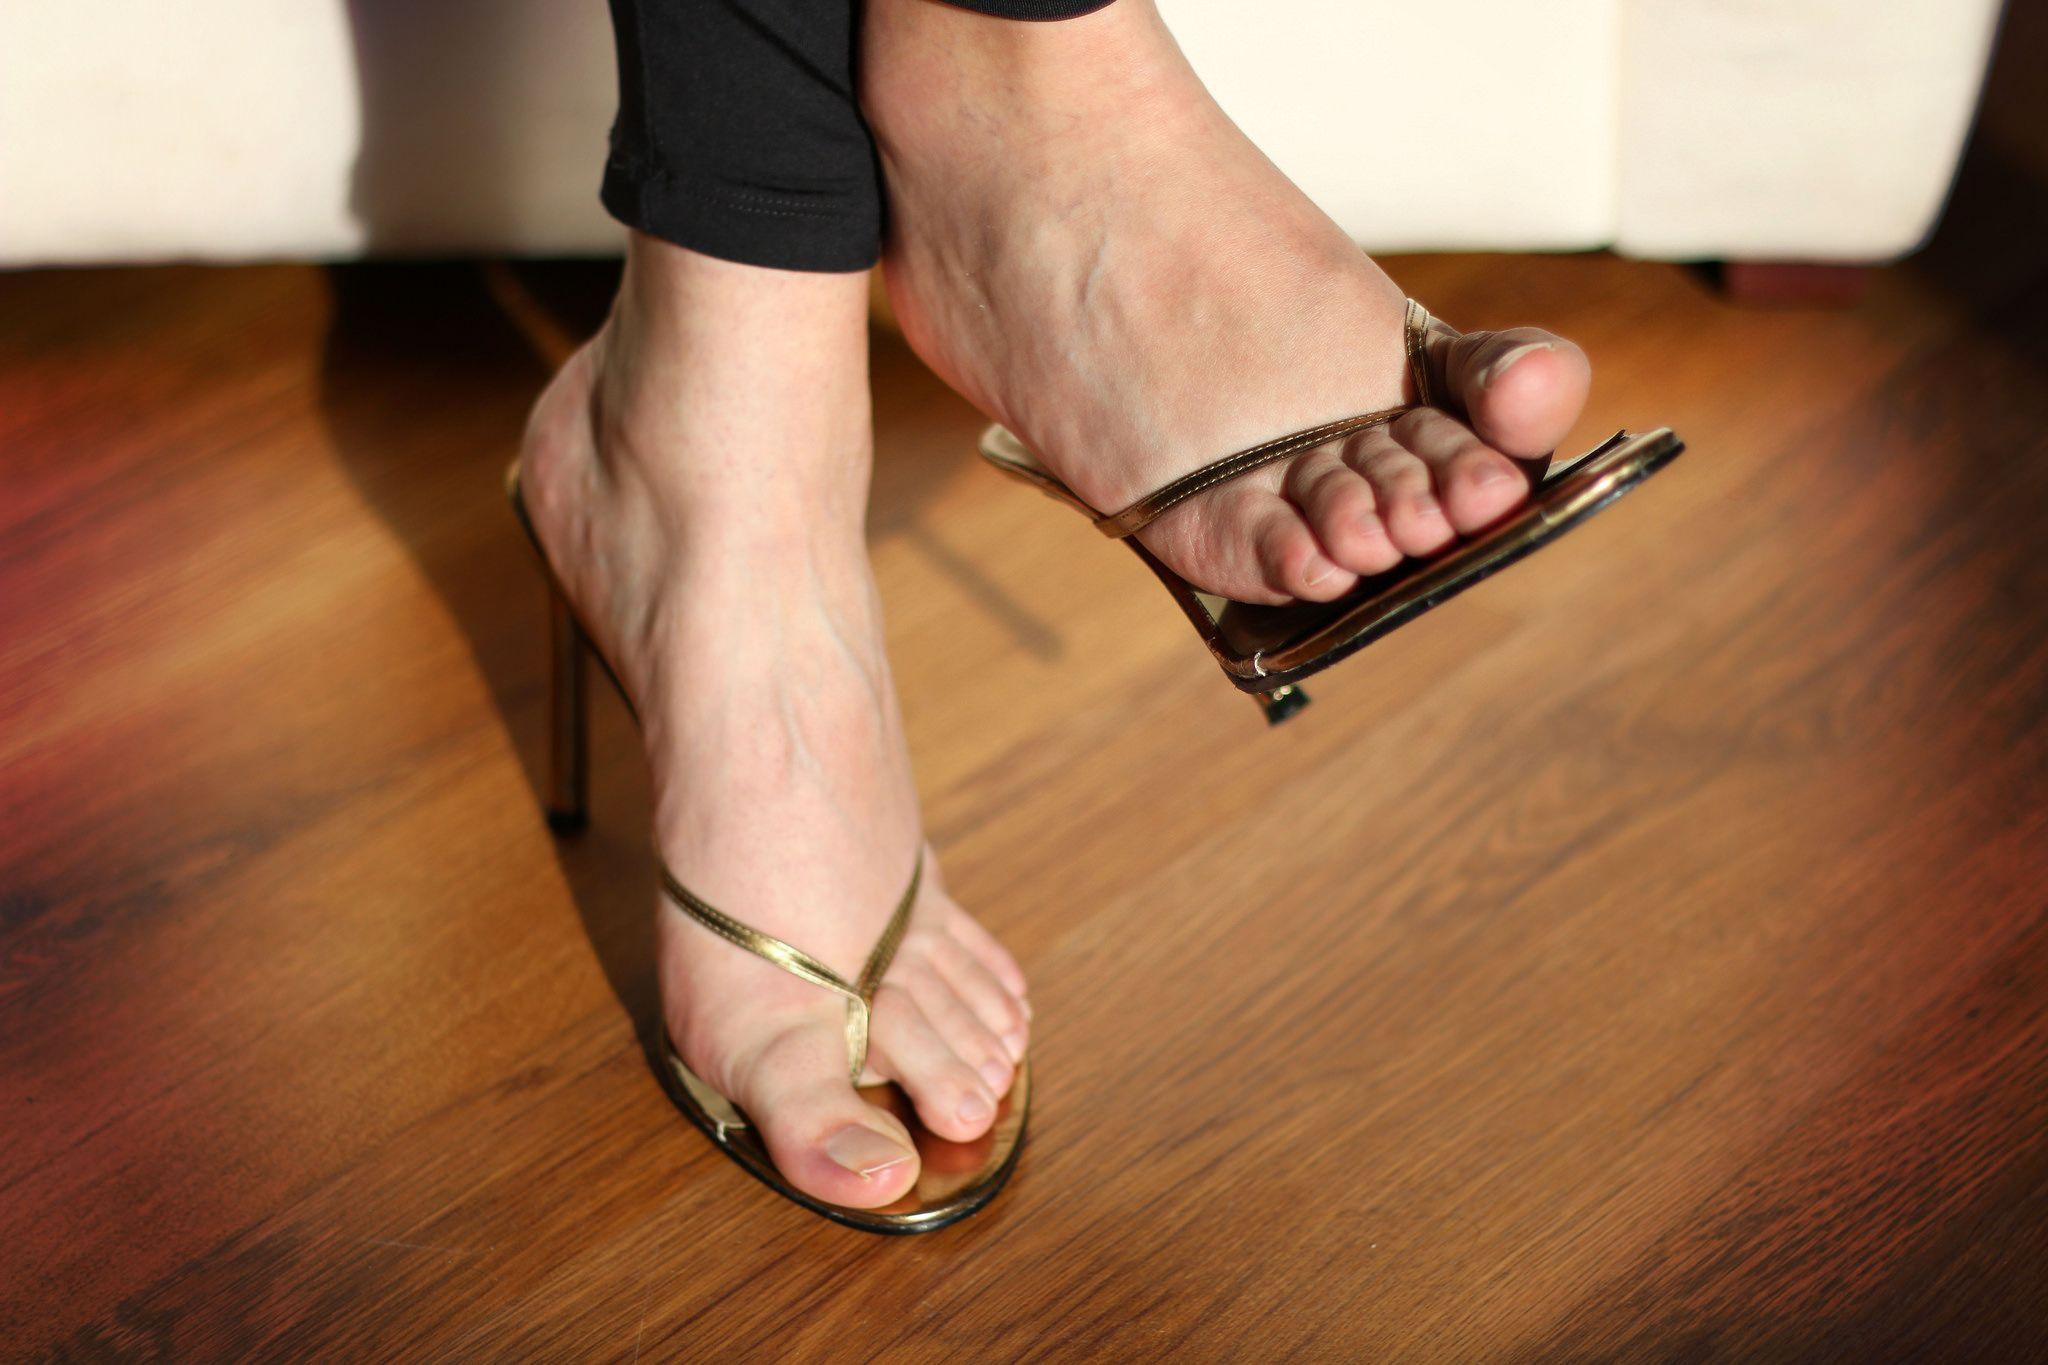 Thongs heel feet high